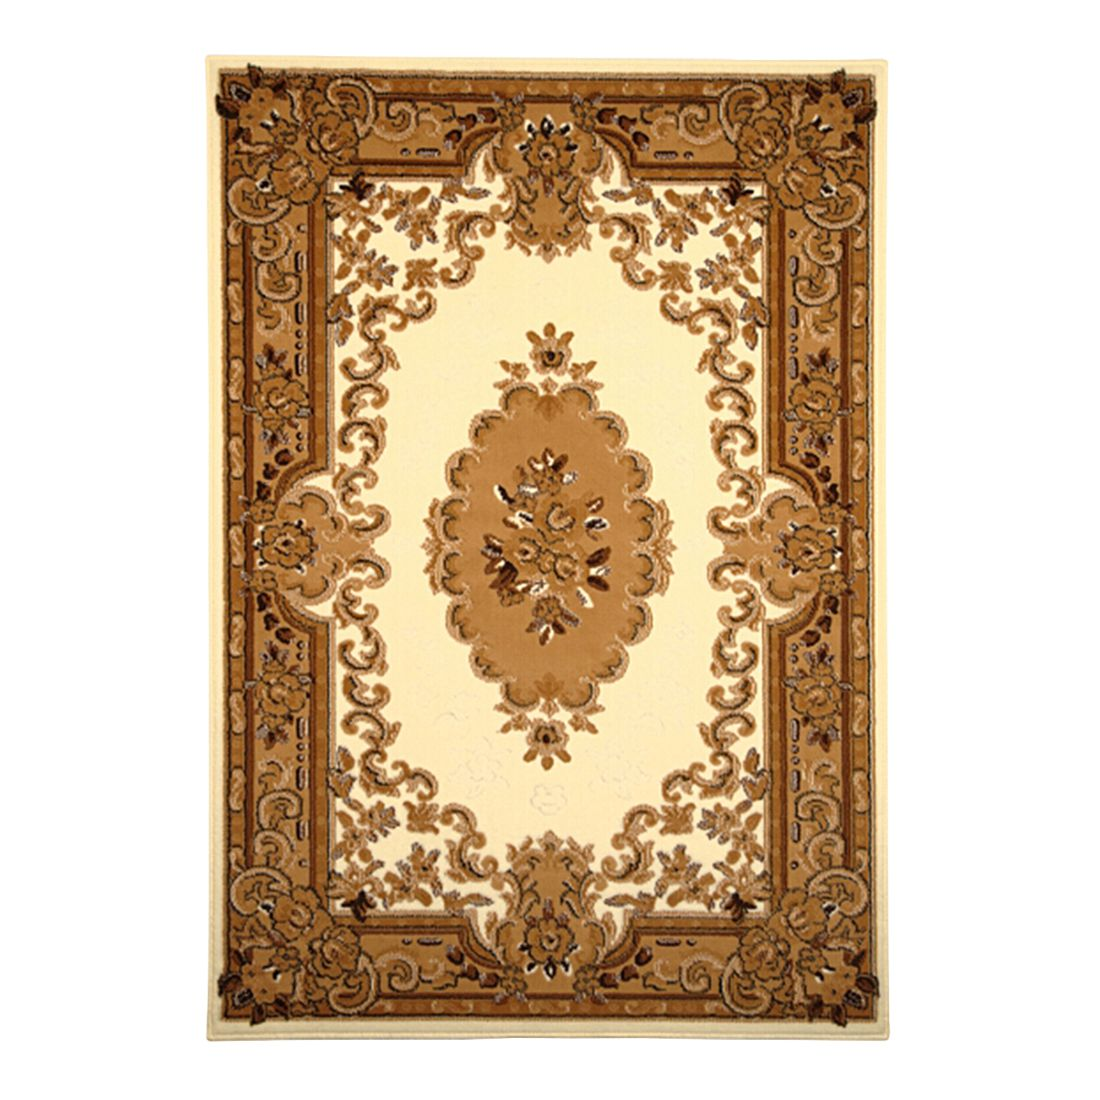 Teppich Peking 710490 – Creme – 340 x 70 cm, KC-Handel bestellen